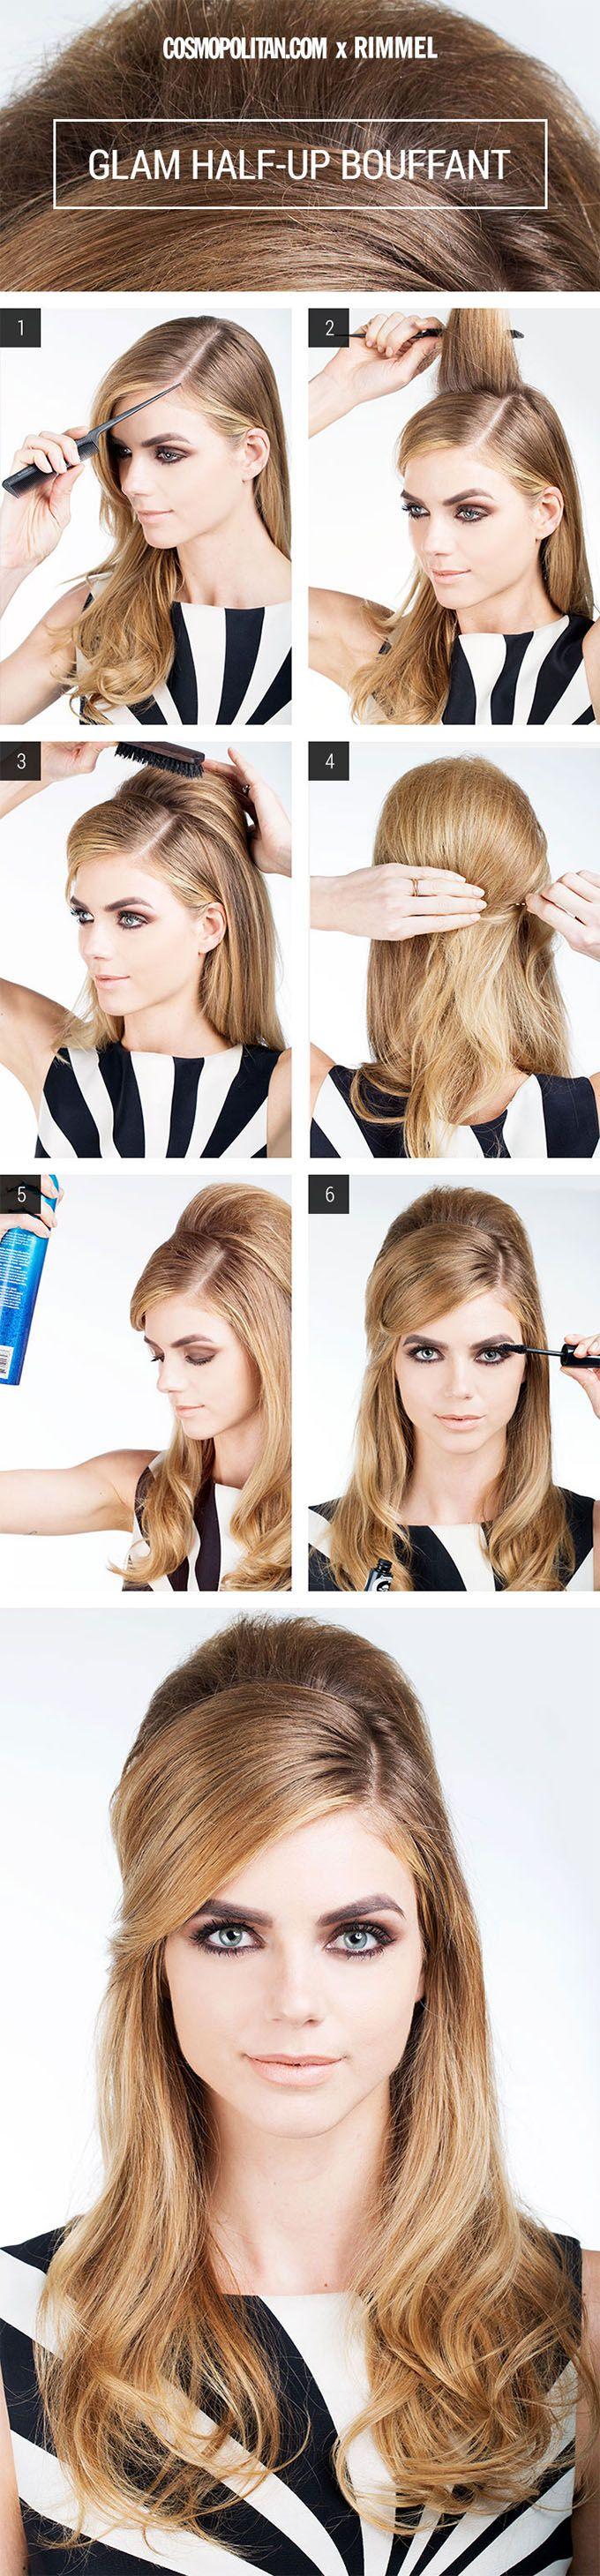 best 25+ 1960s hair tutorial ideas on pinterest | bouffant